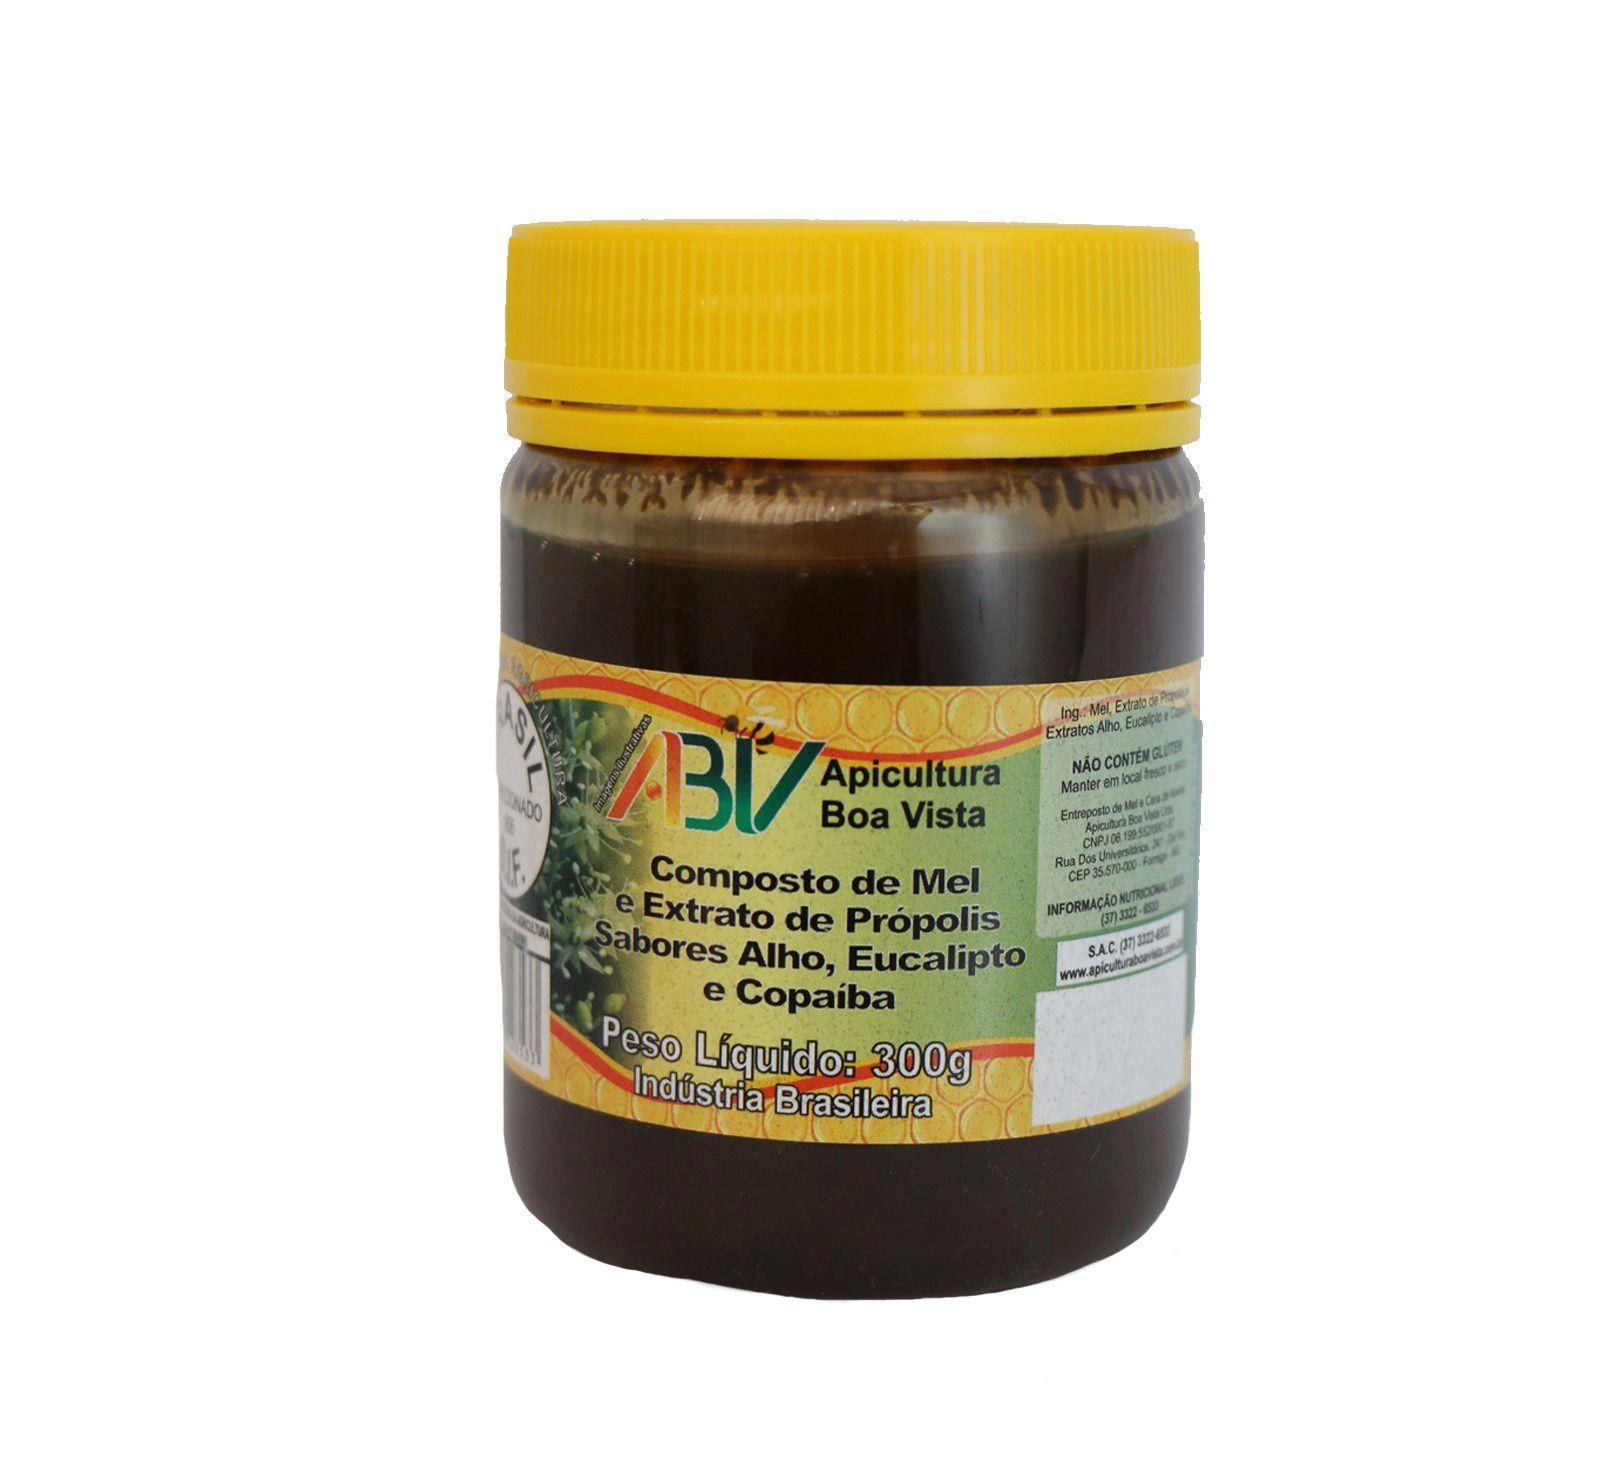 Composto de mel e extrato de própolis - sabores alho, eucalipto e copaíba pote plástico 300g